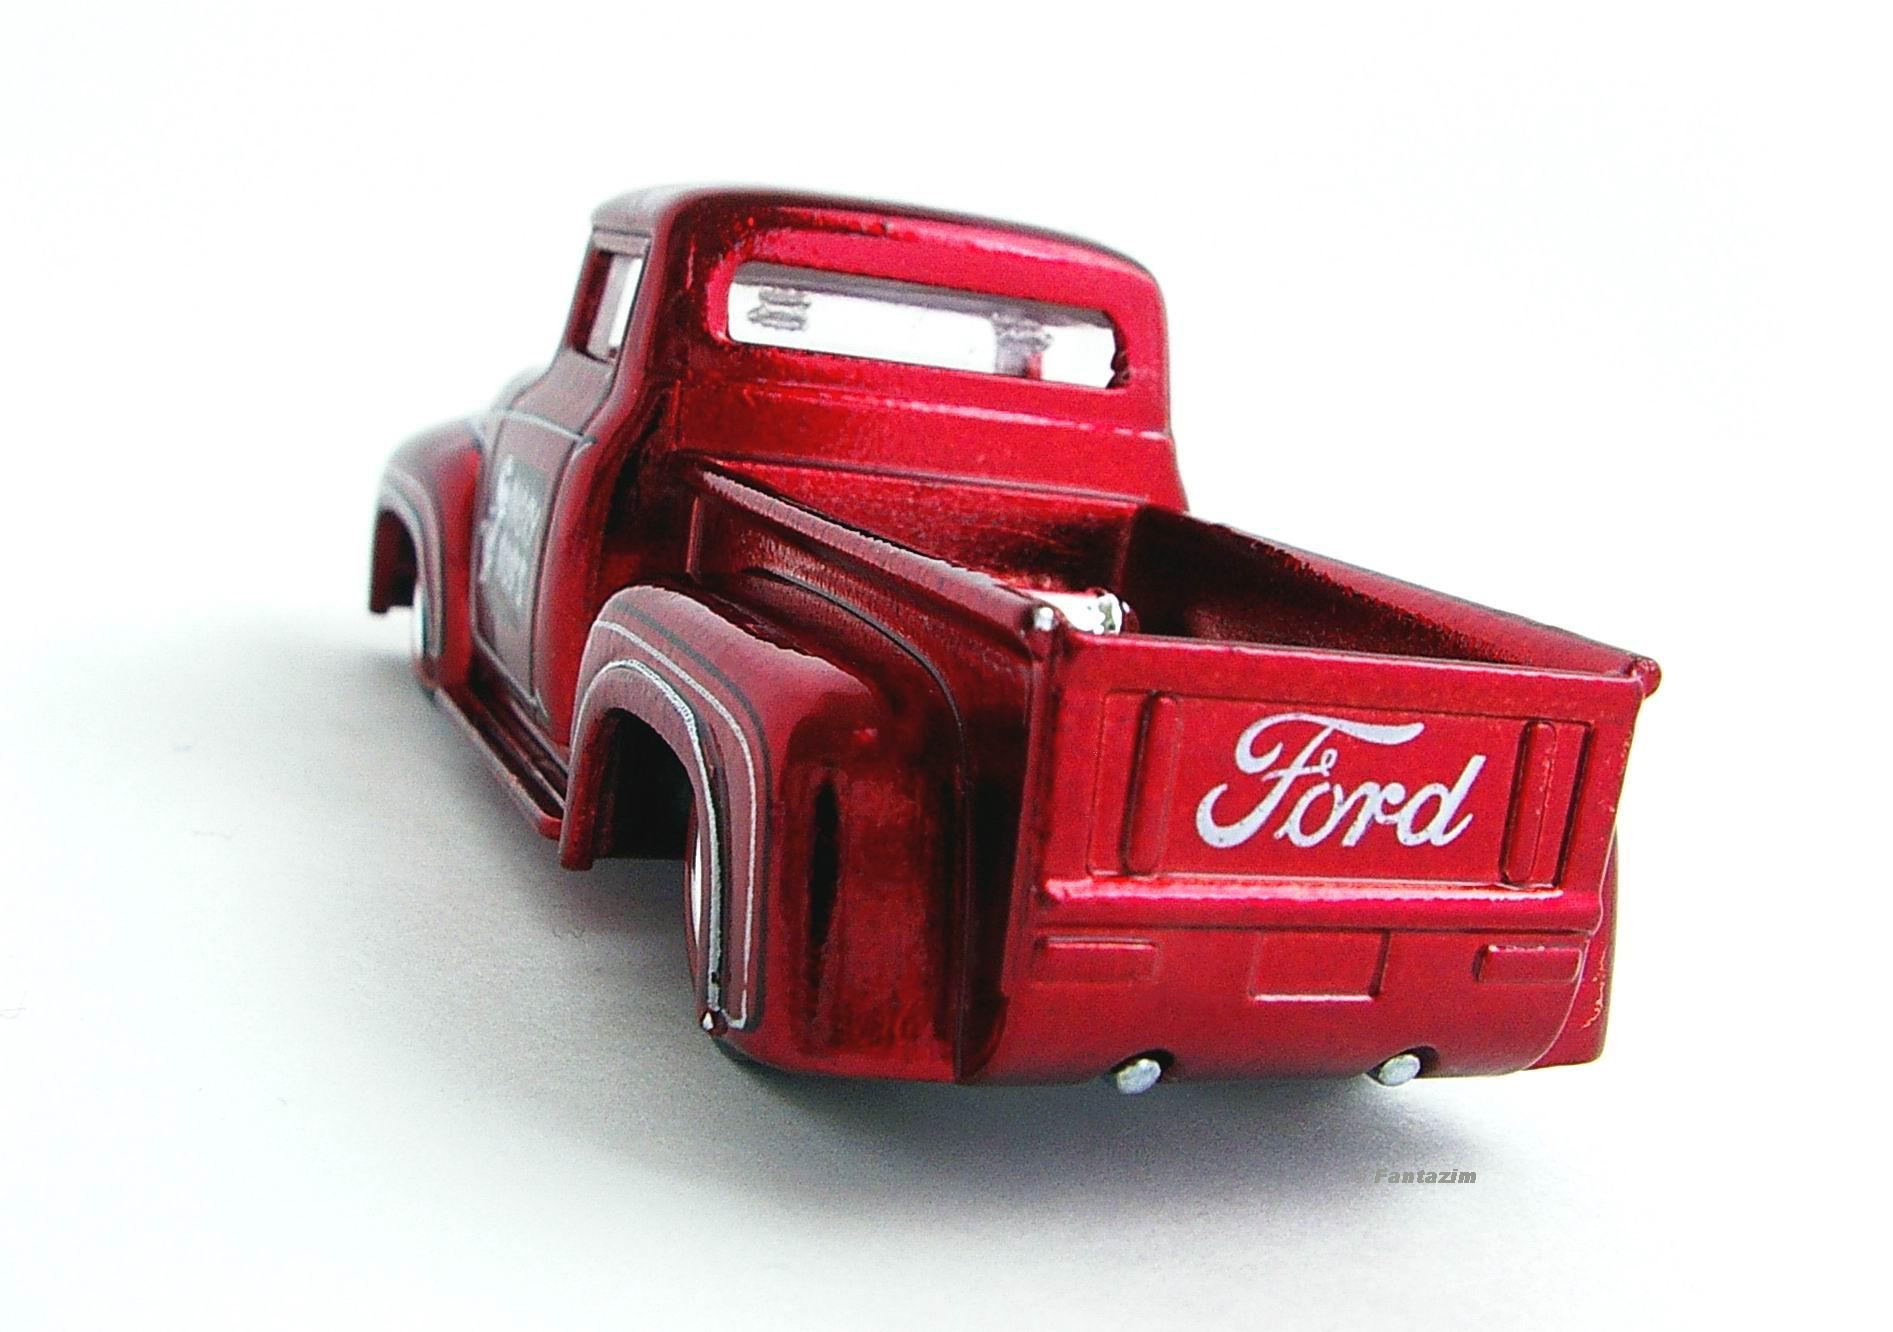 Image Custom 56 Ford Truck Red Rear View Jpg Hot Wheels Wiki